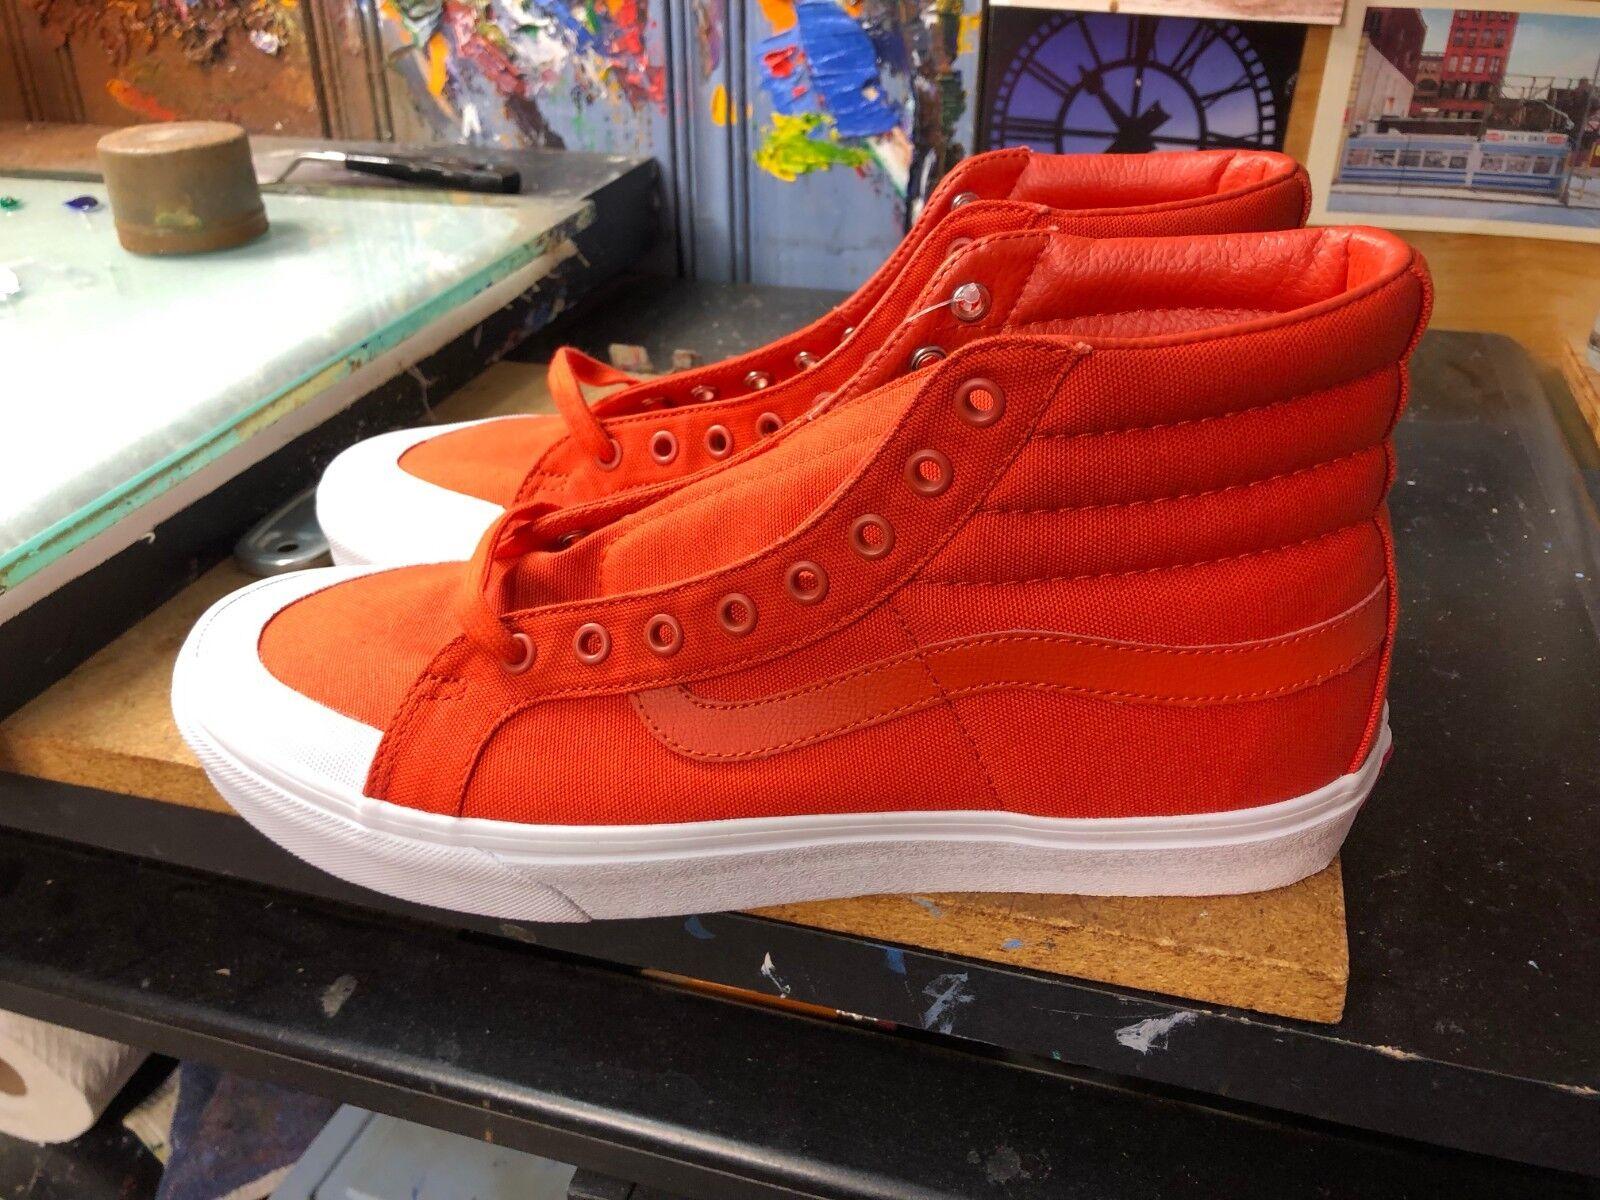 Vans SK8-Hi Reissue (Canvas) Pureed Pumpkin  Size US 11.5 Men's VN0A3TKPU7W